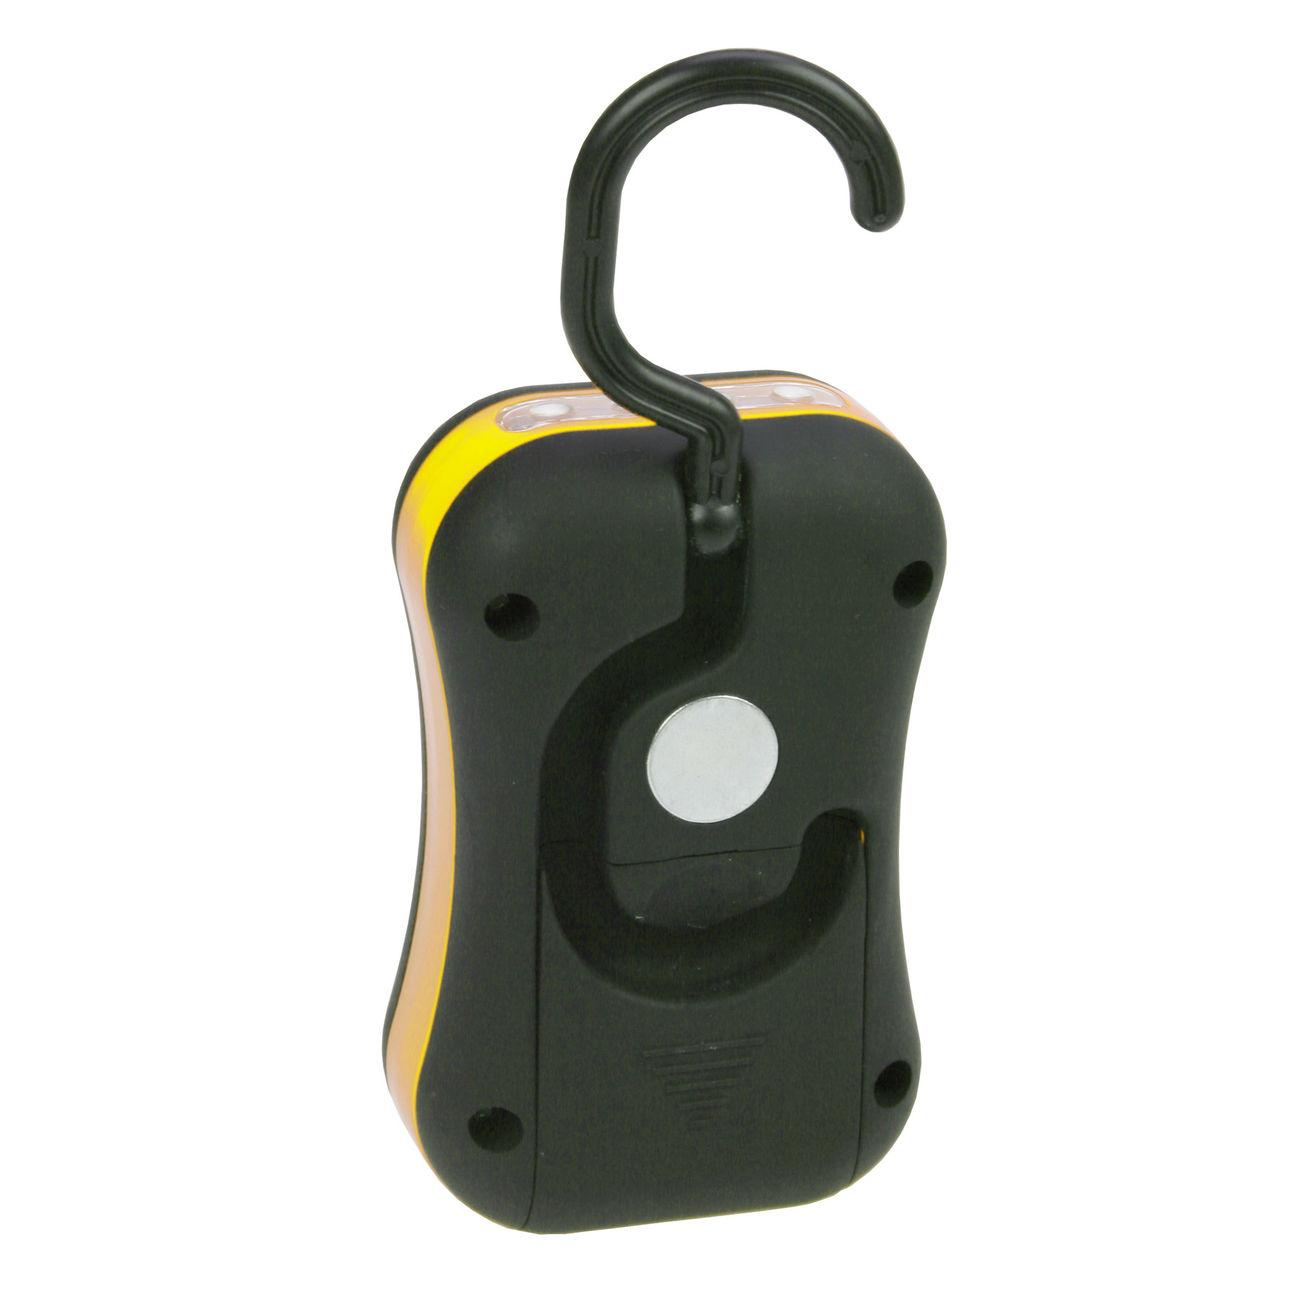 Dörr LED-Taschenlampe X24 Plus 200 Lux gelb günstig - Kotte & Zeller